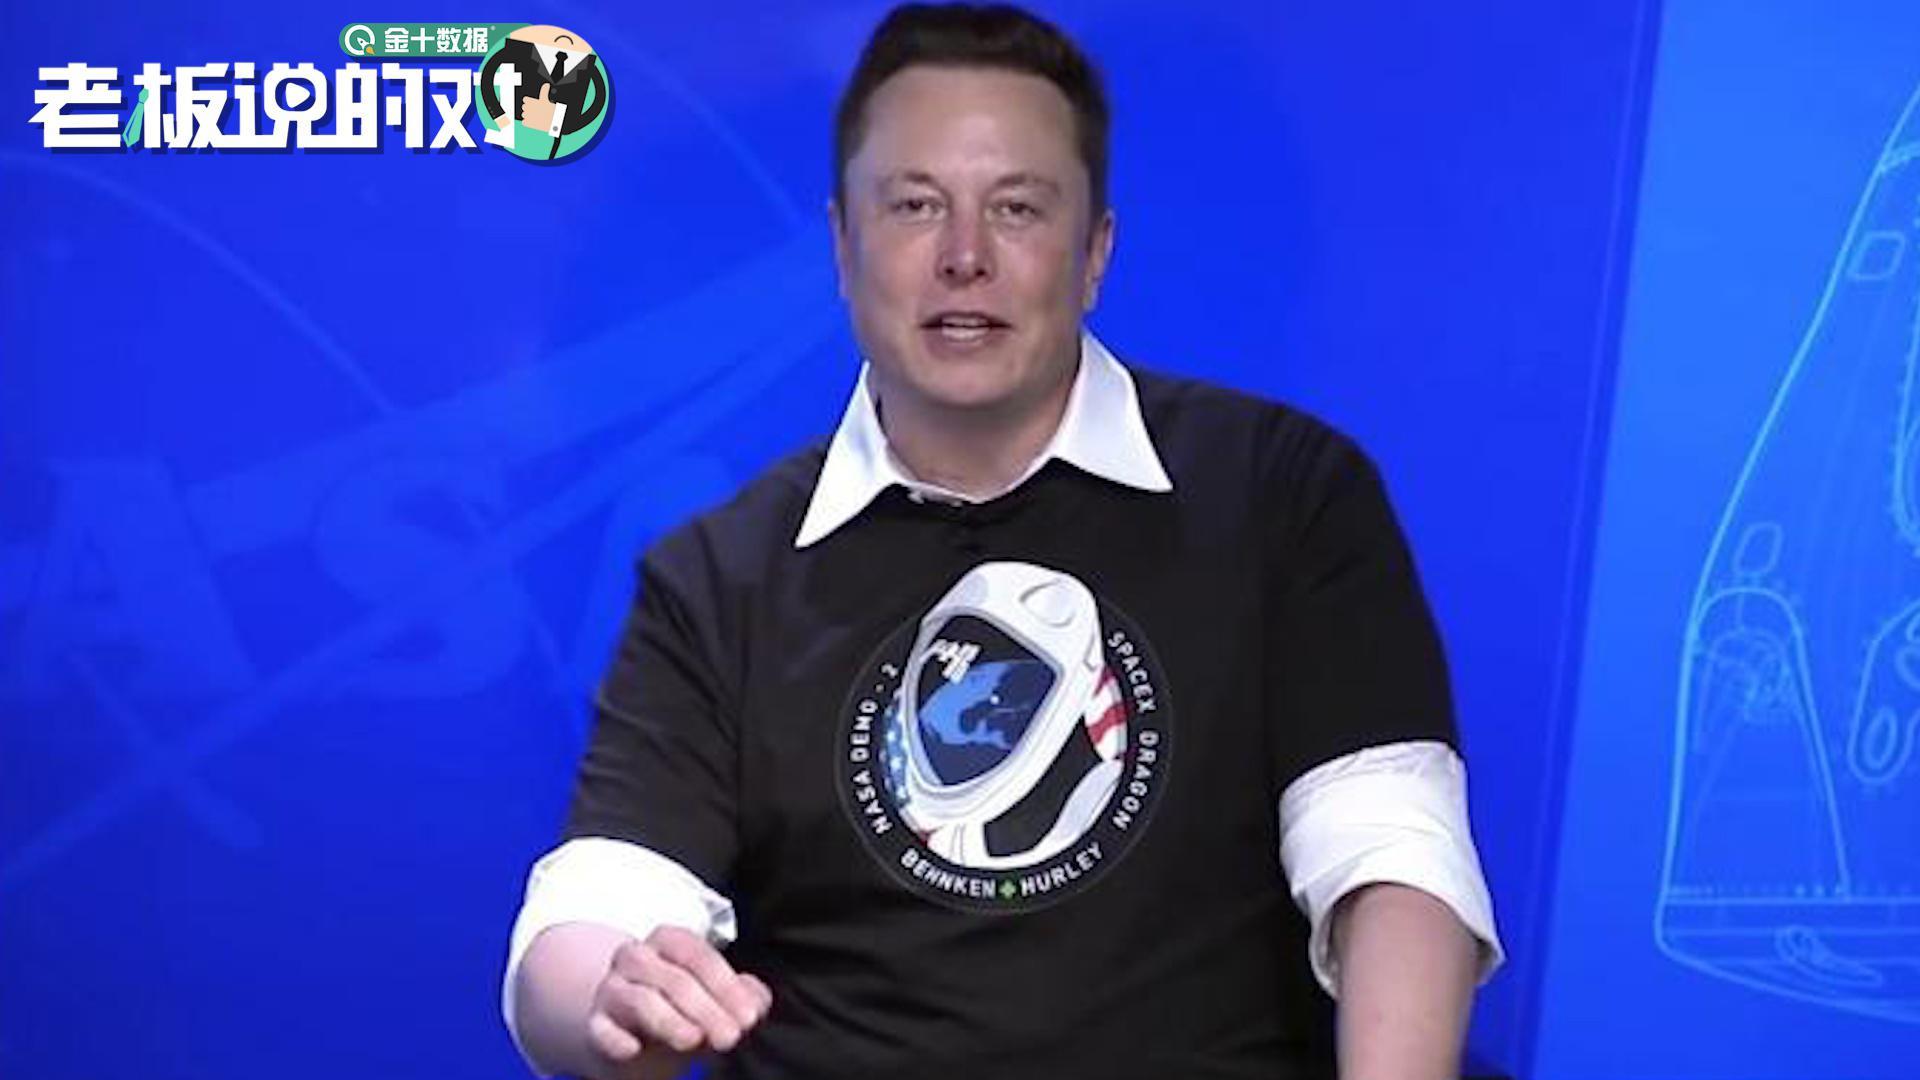 Space X飞船载人首飞收官!马斯克穿着黑皮衣,小胖手十分抢镜